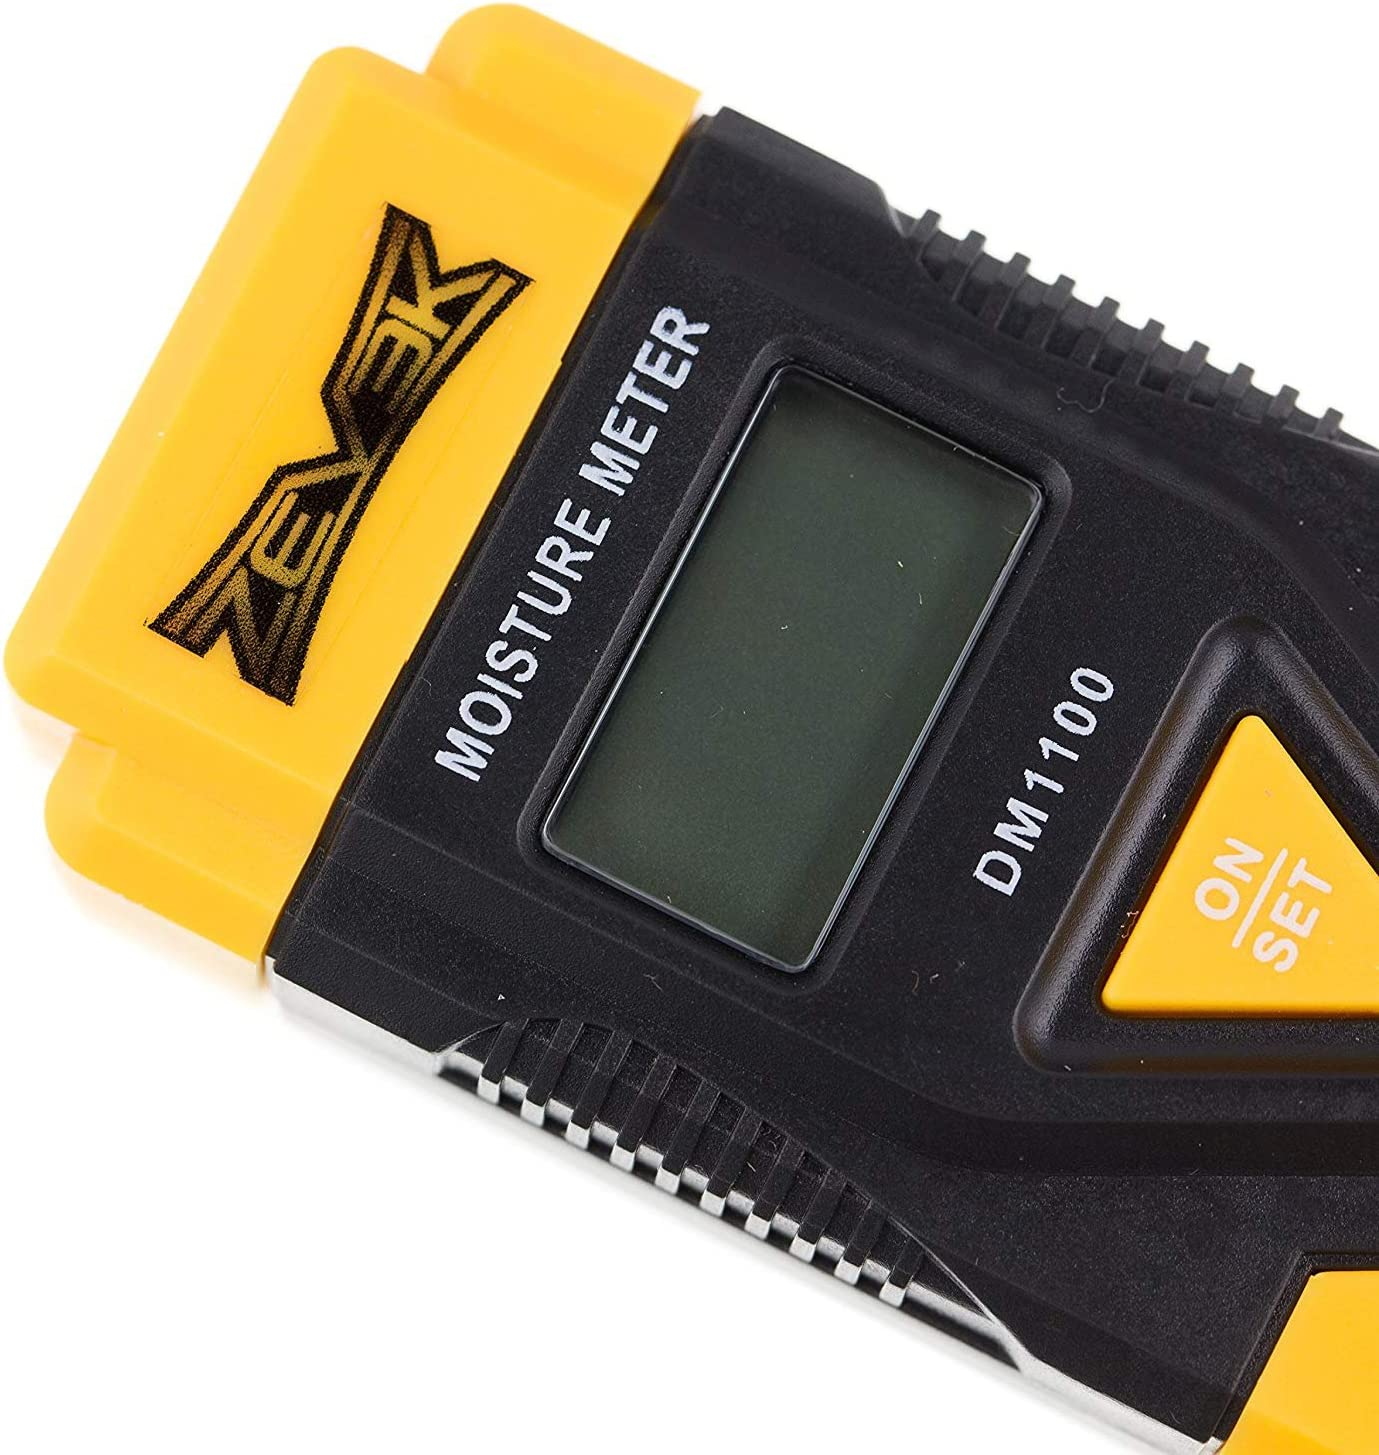 Zevek Digital Moisture Meter Detector Tester CE Approved-Detects Damp in Wood or